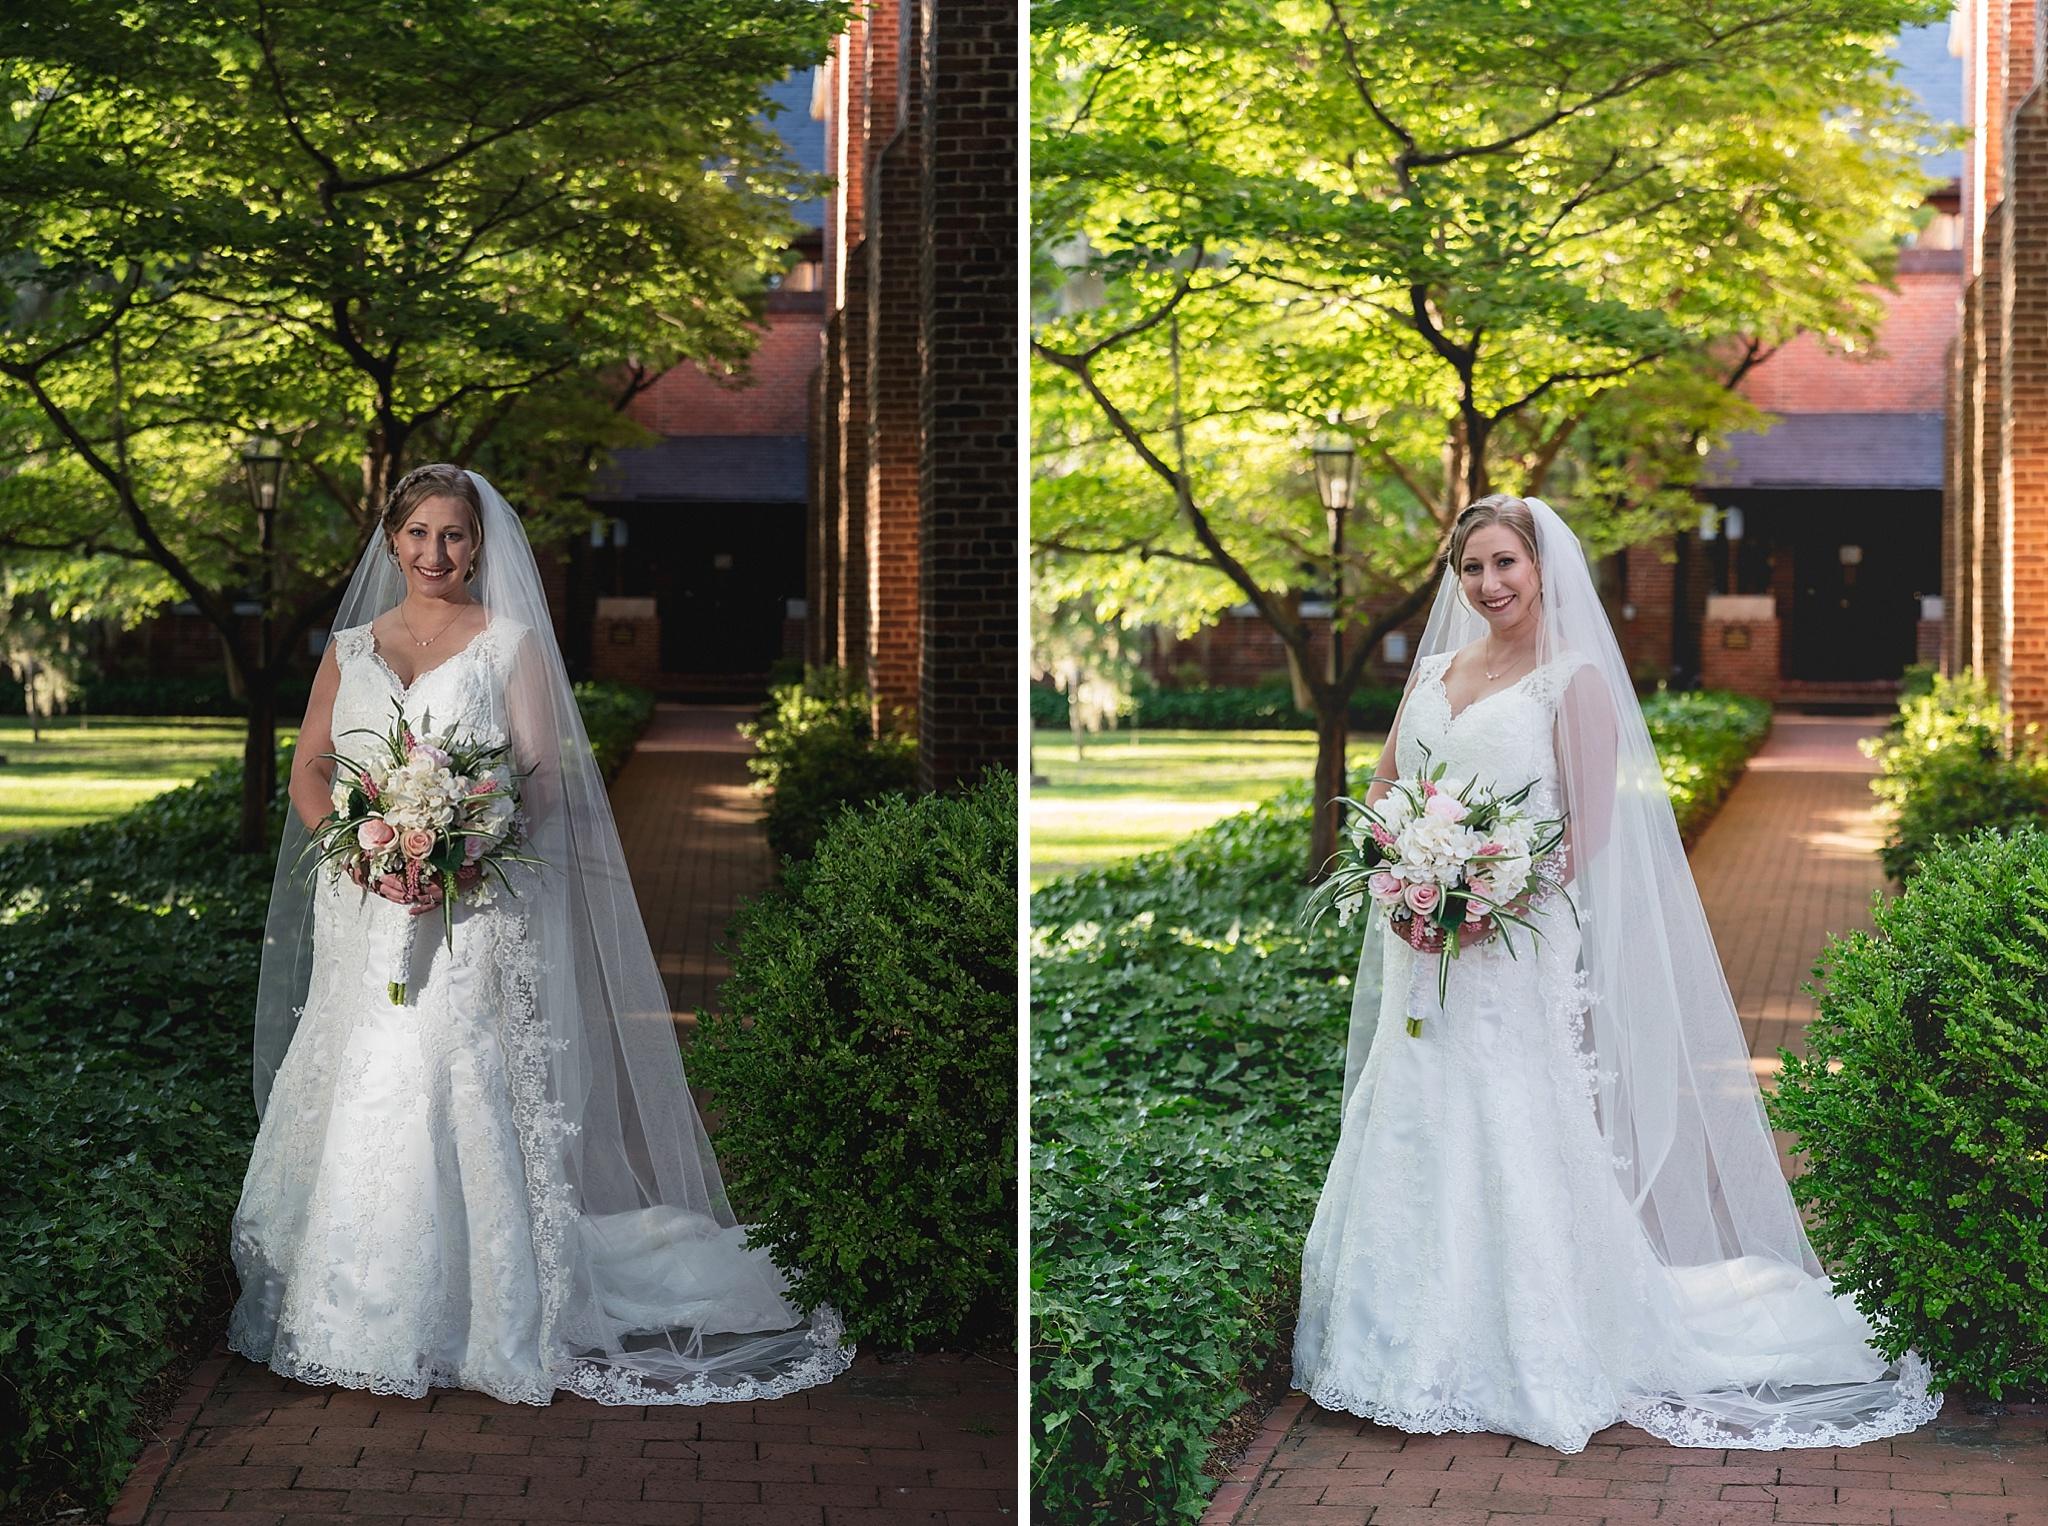 New-Bern-NC-Wedding-Photographer-059.jpg